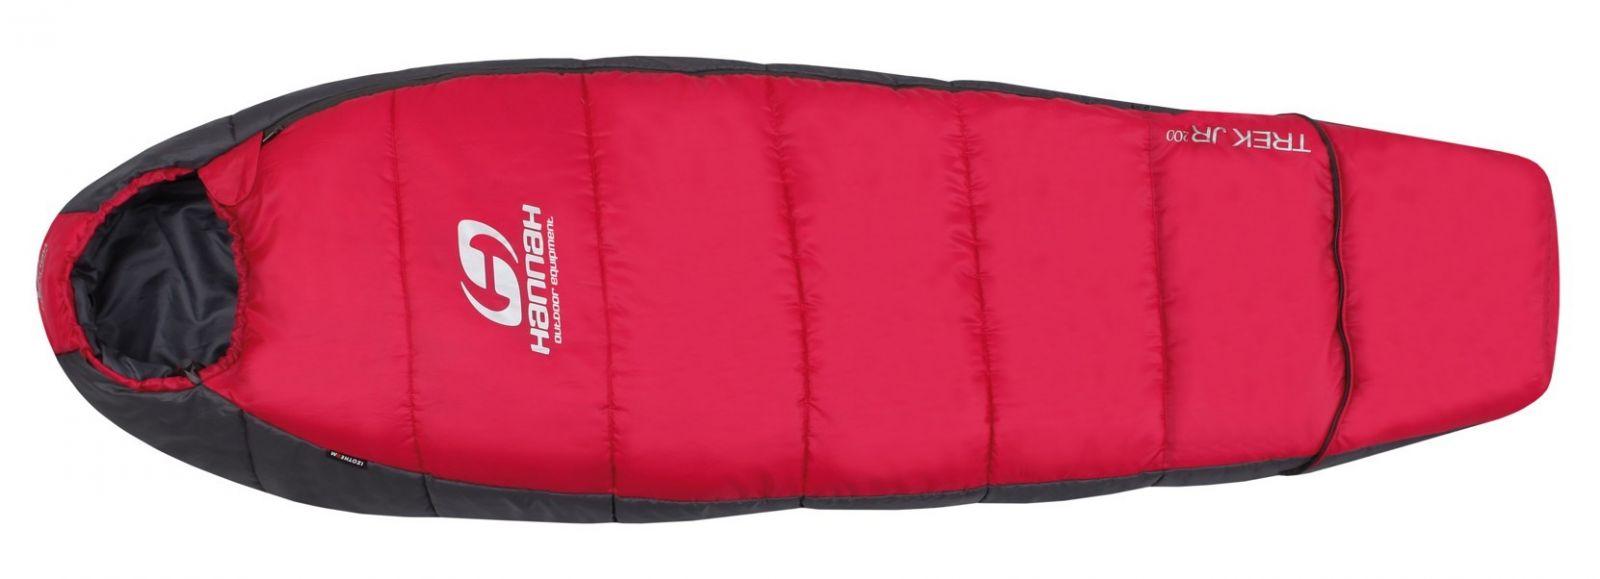 Tazz-Sport - Hannah Trek JR 200 Bright rose/graphite 145 cm dětský spací pytel